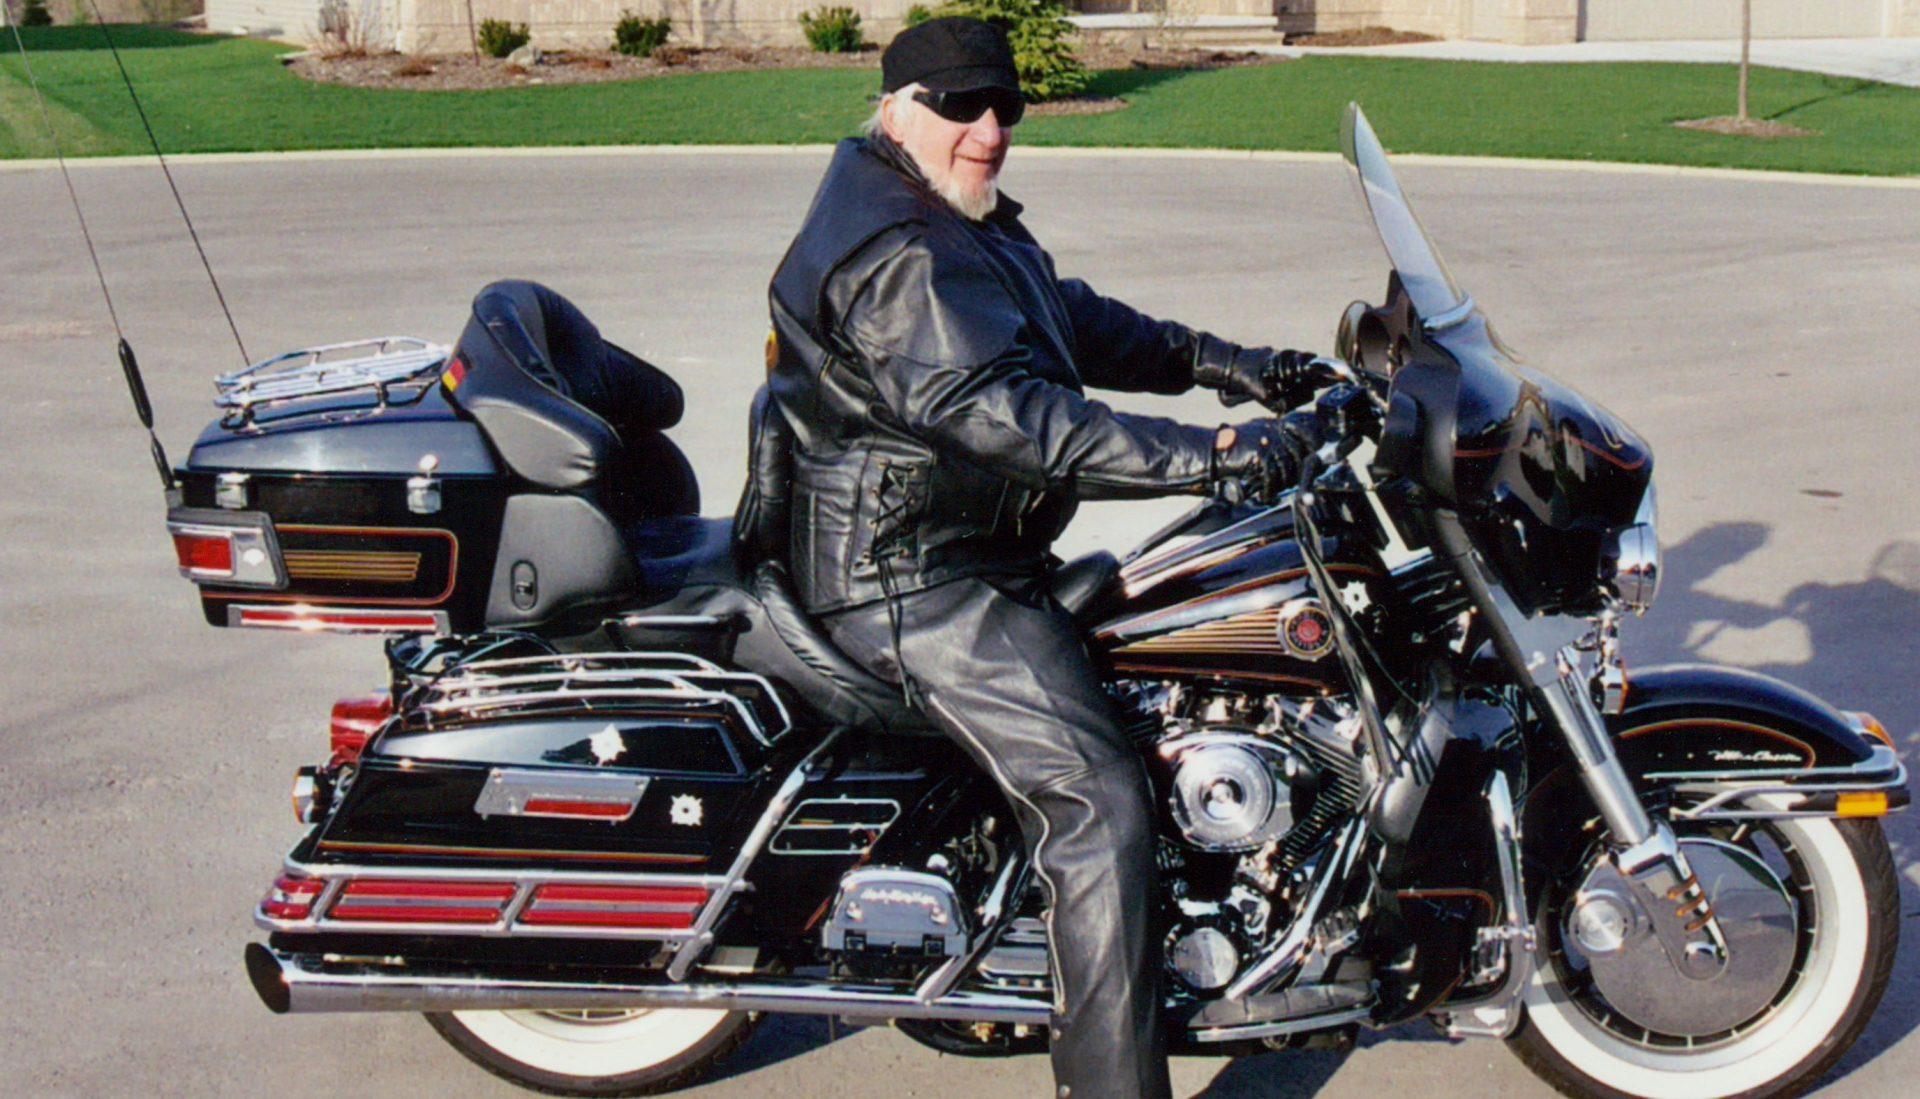 Ride like the wind!